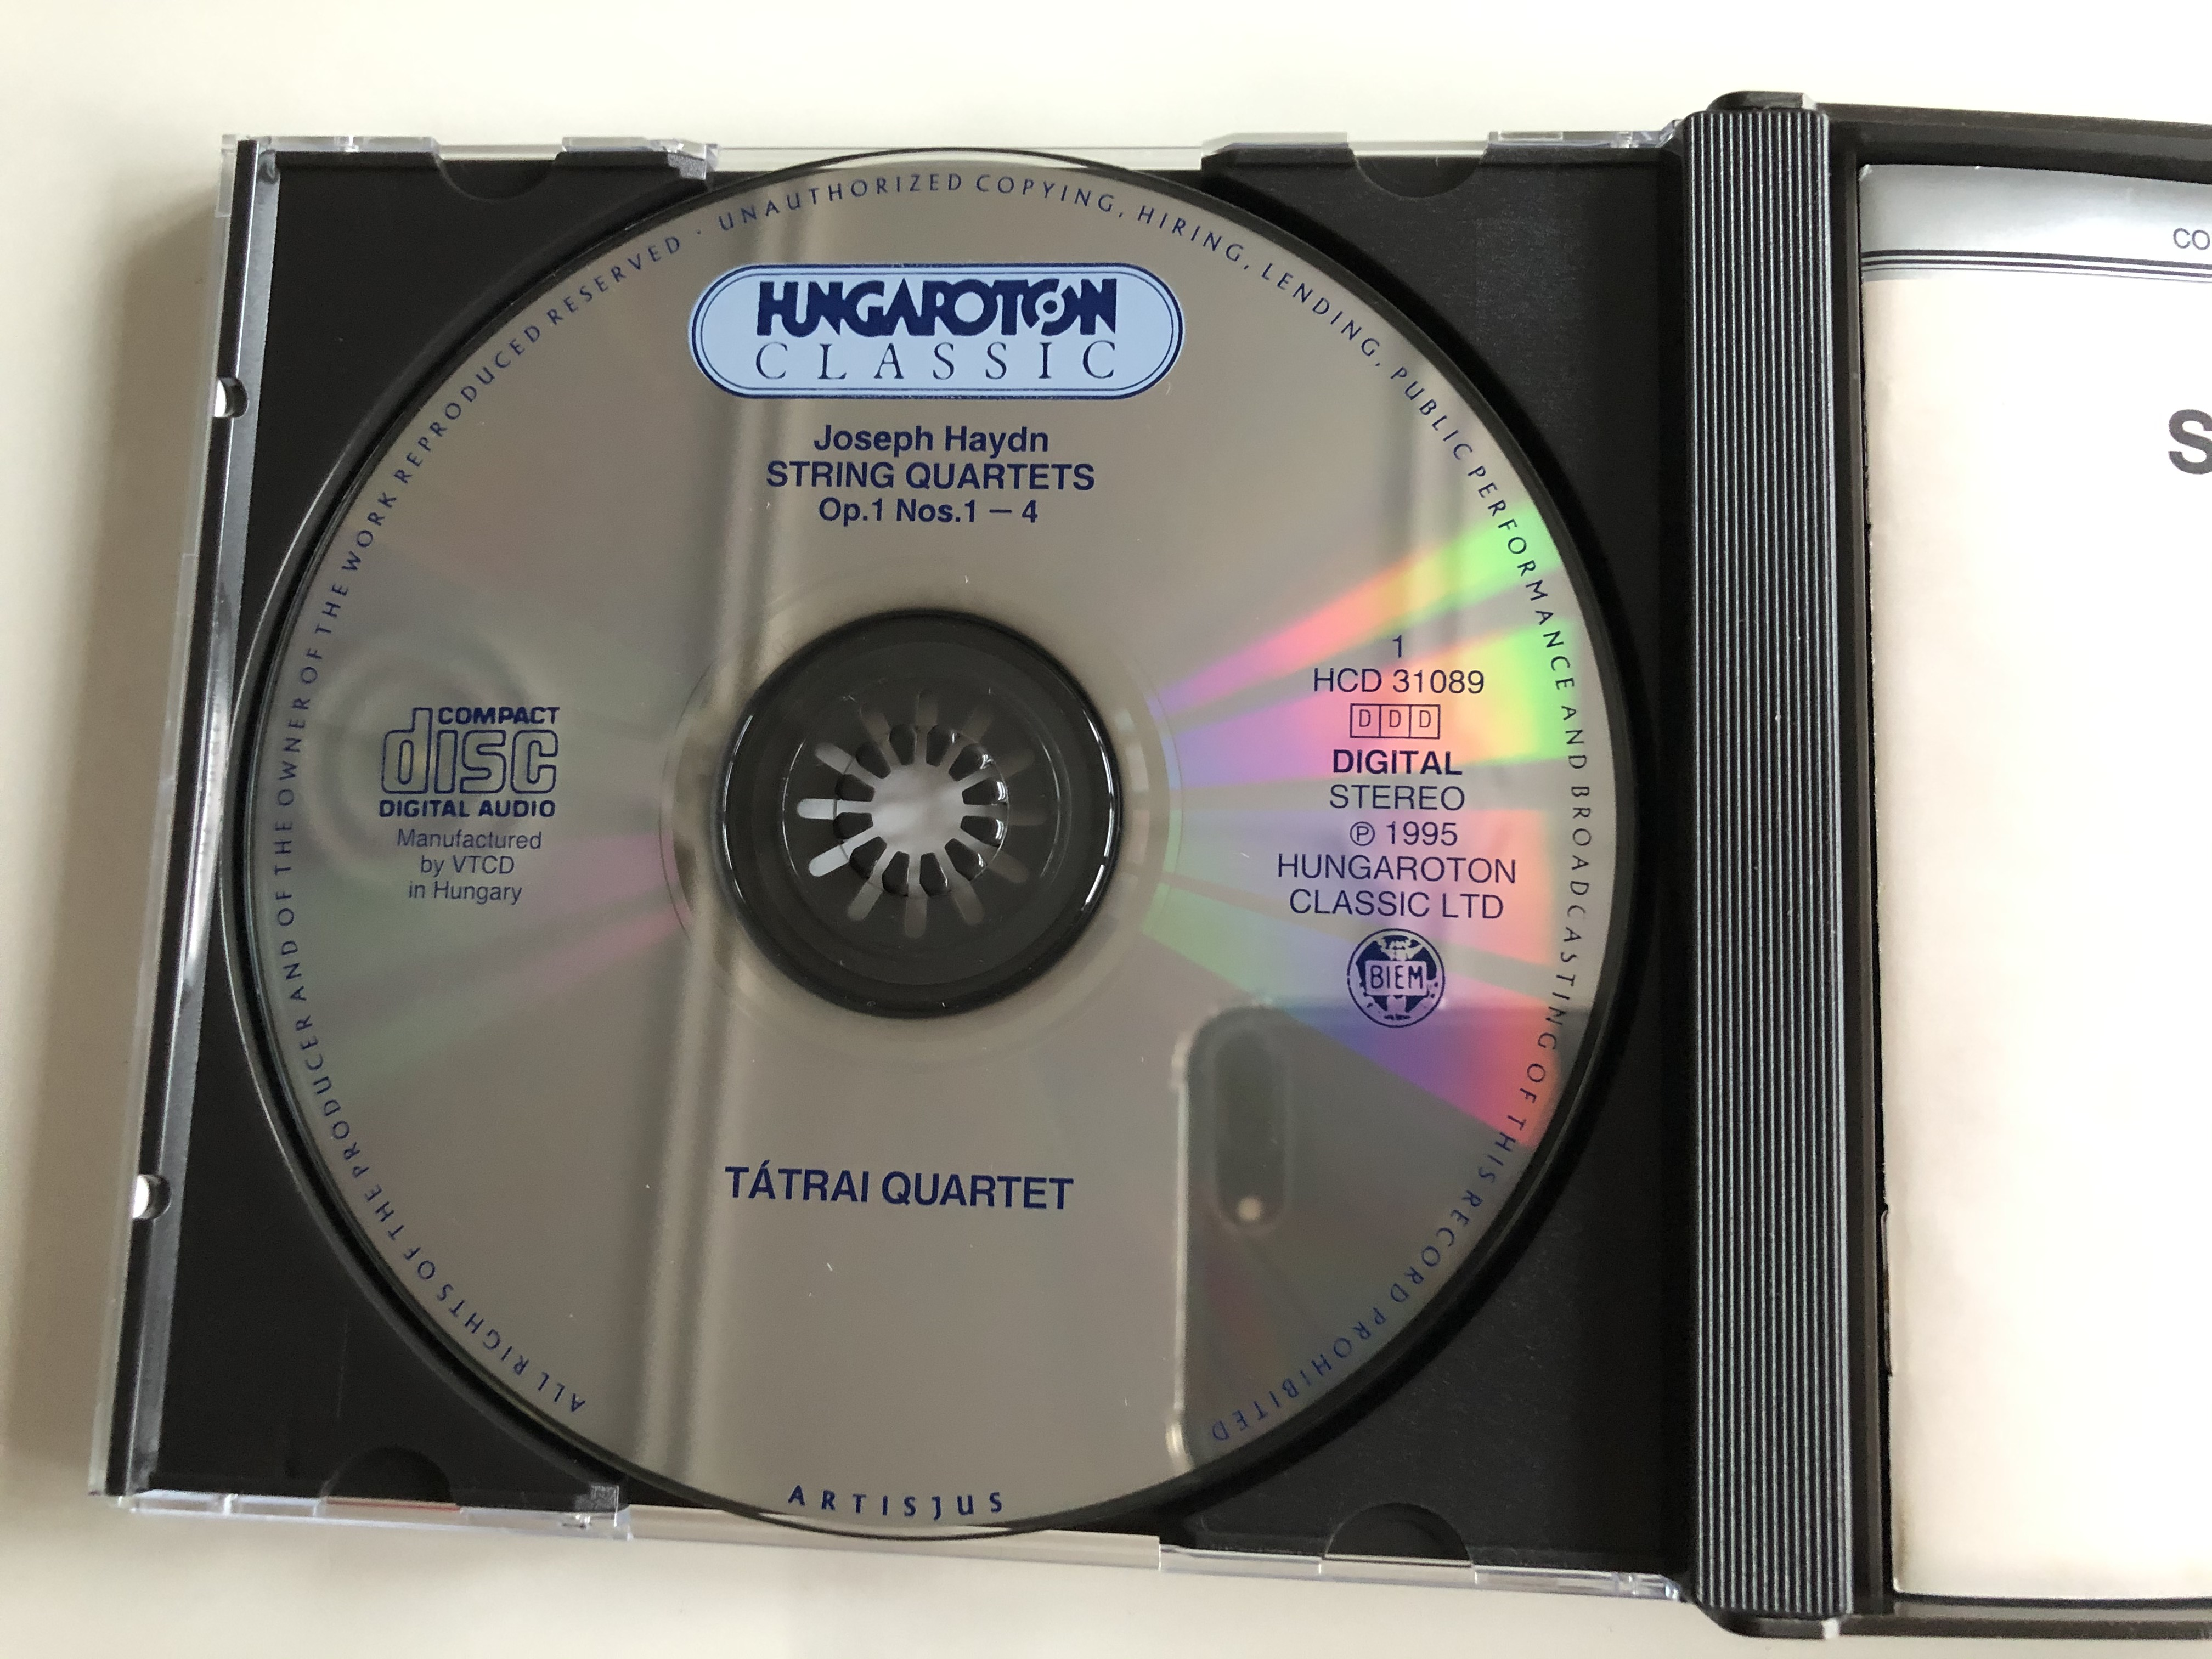 joseph-haydn-string-quartets-opp.1-2-42-103-t-trai-quartet-hungaroton-classic-3x-audio-cd-1995-stereo-hcd-31089-91-2-.jpg